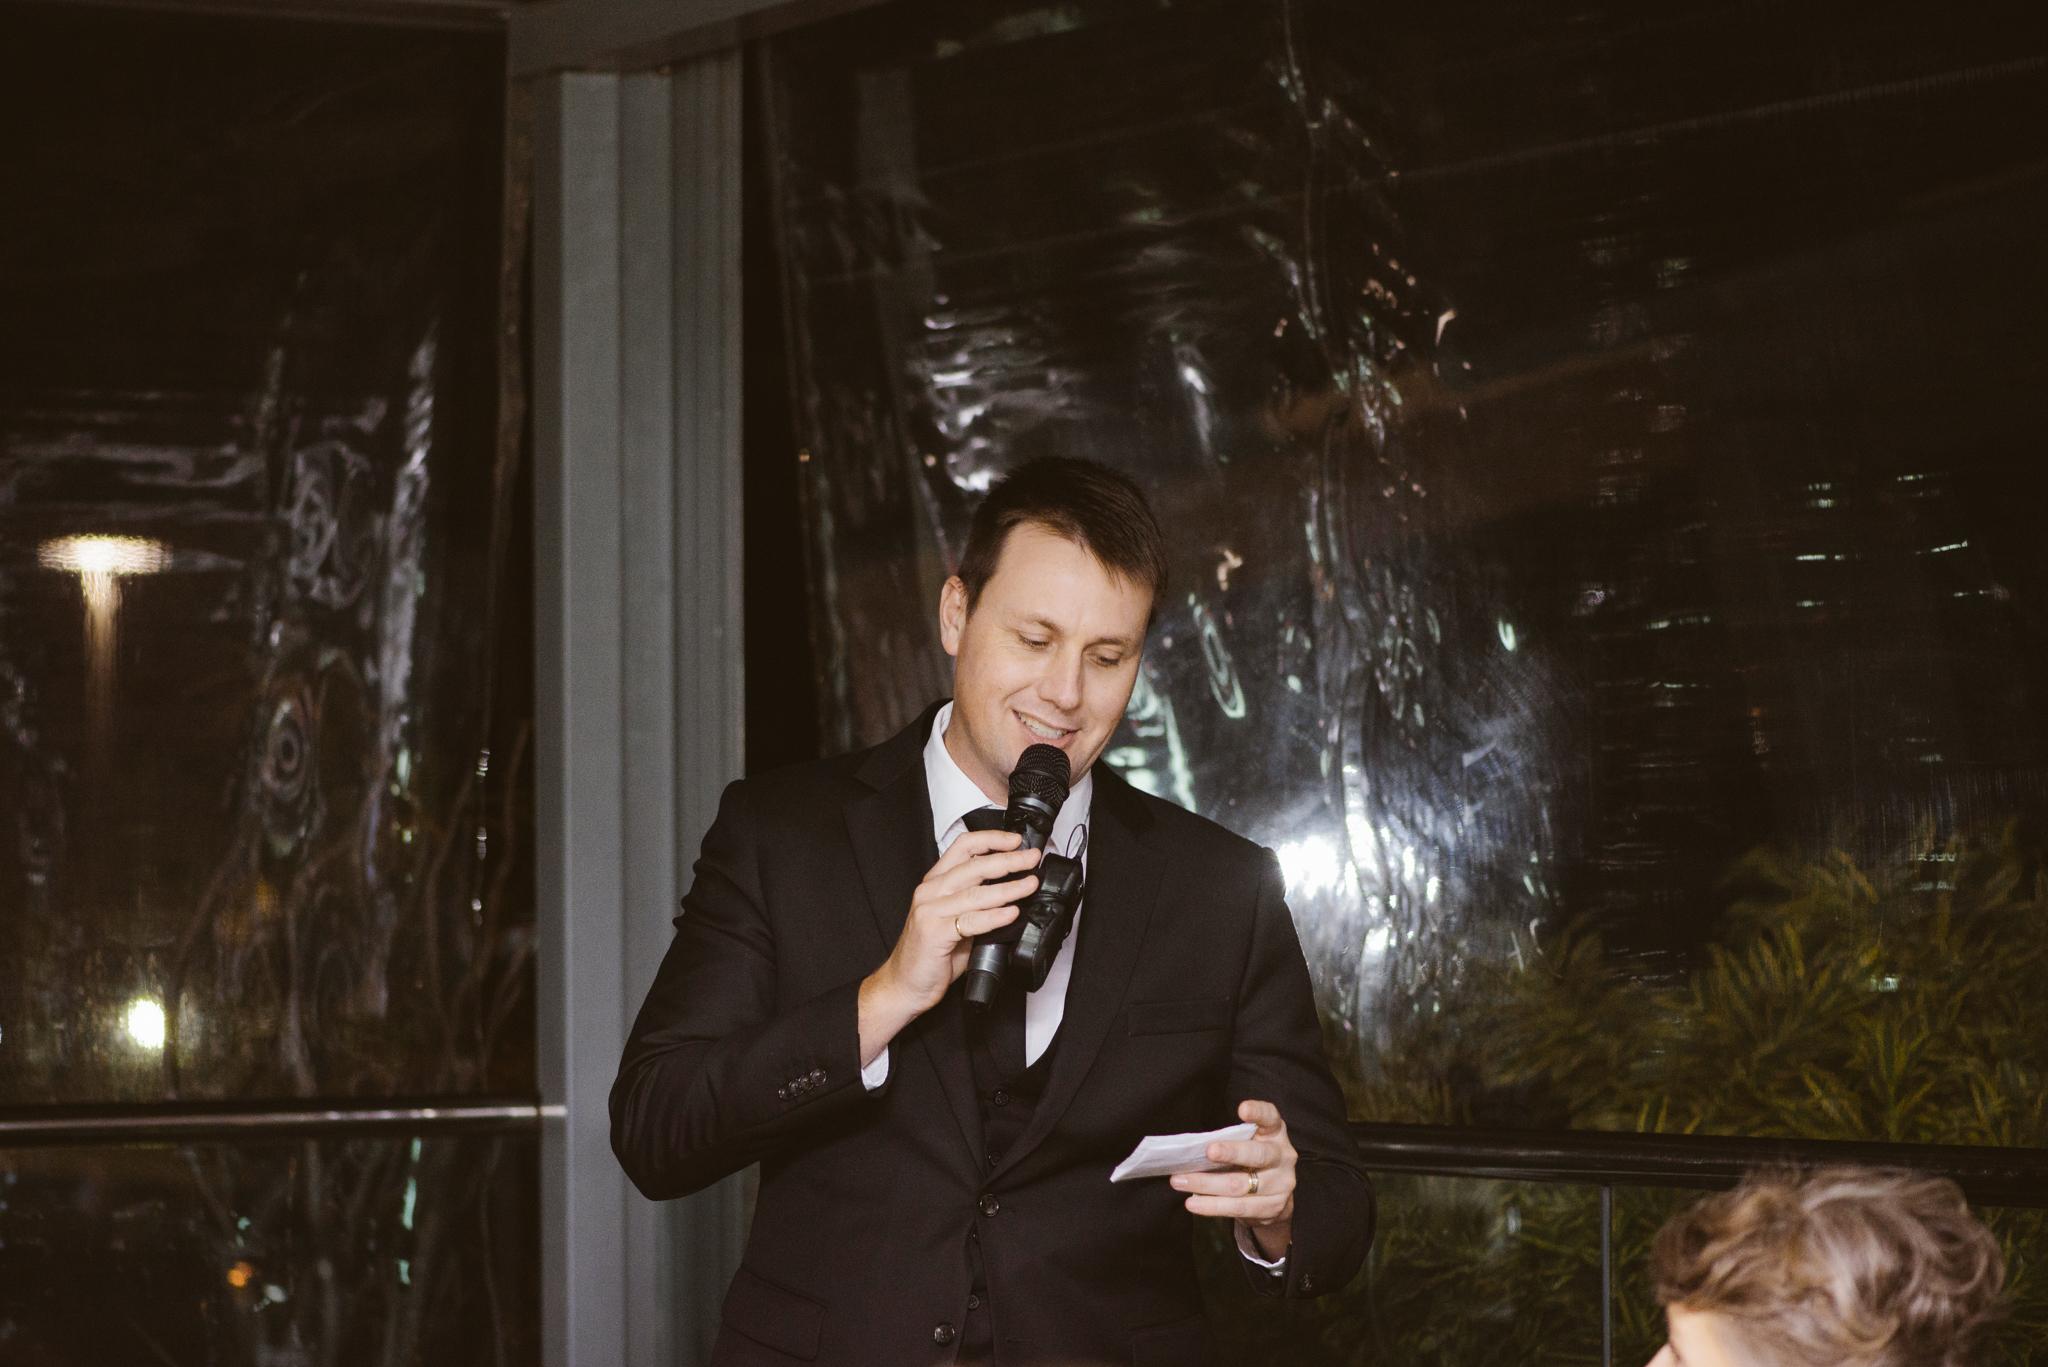 TheFollans_Gold Coast Wedding Photography - G&M DJs-8.jpg